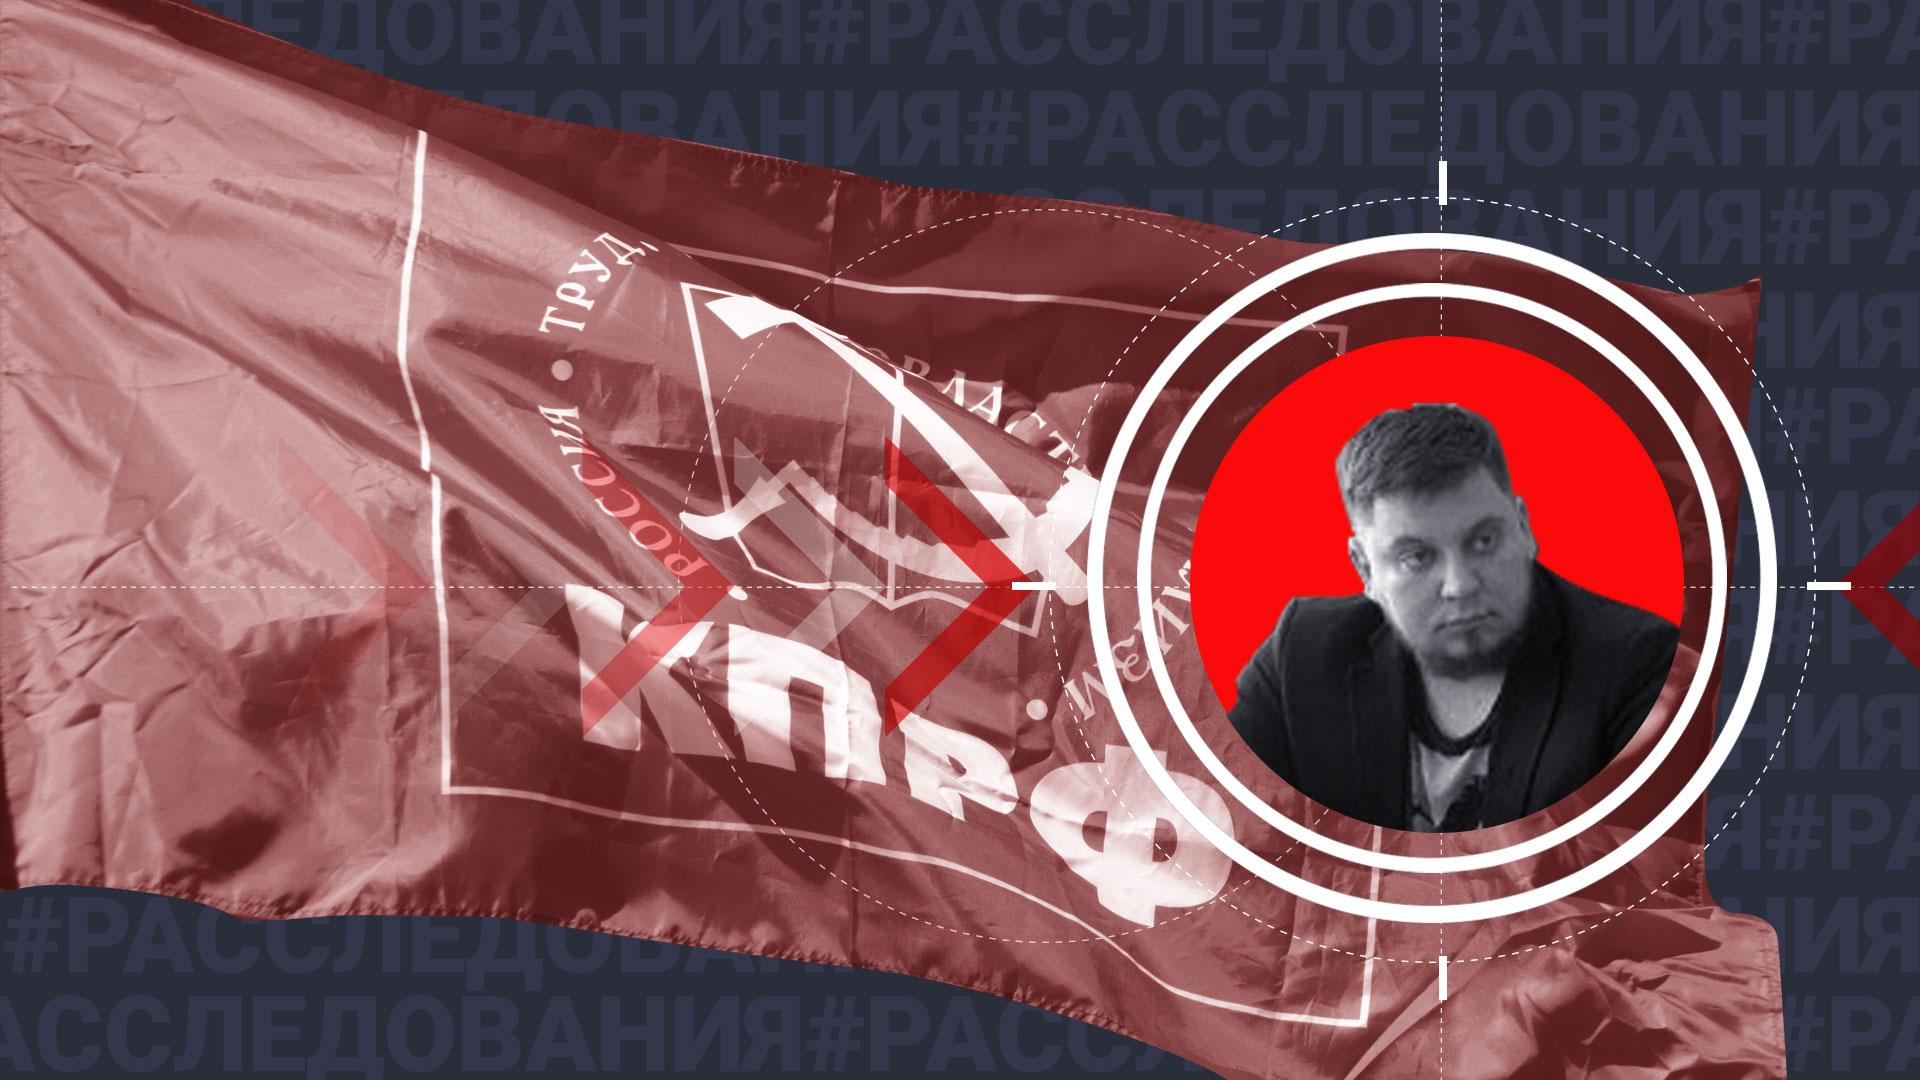 Убийца и инвалид: Как депутат от КПРФ убил избирателя